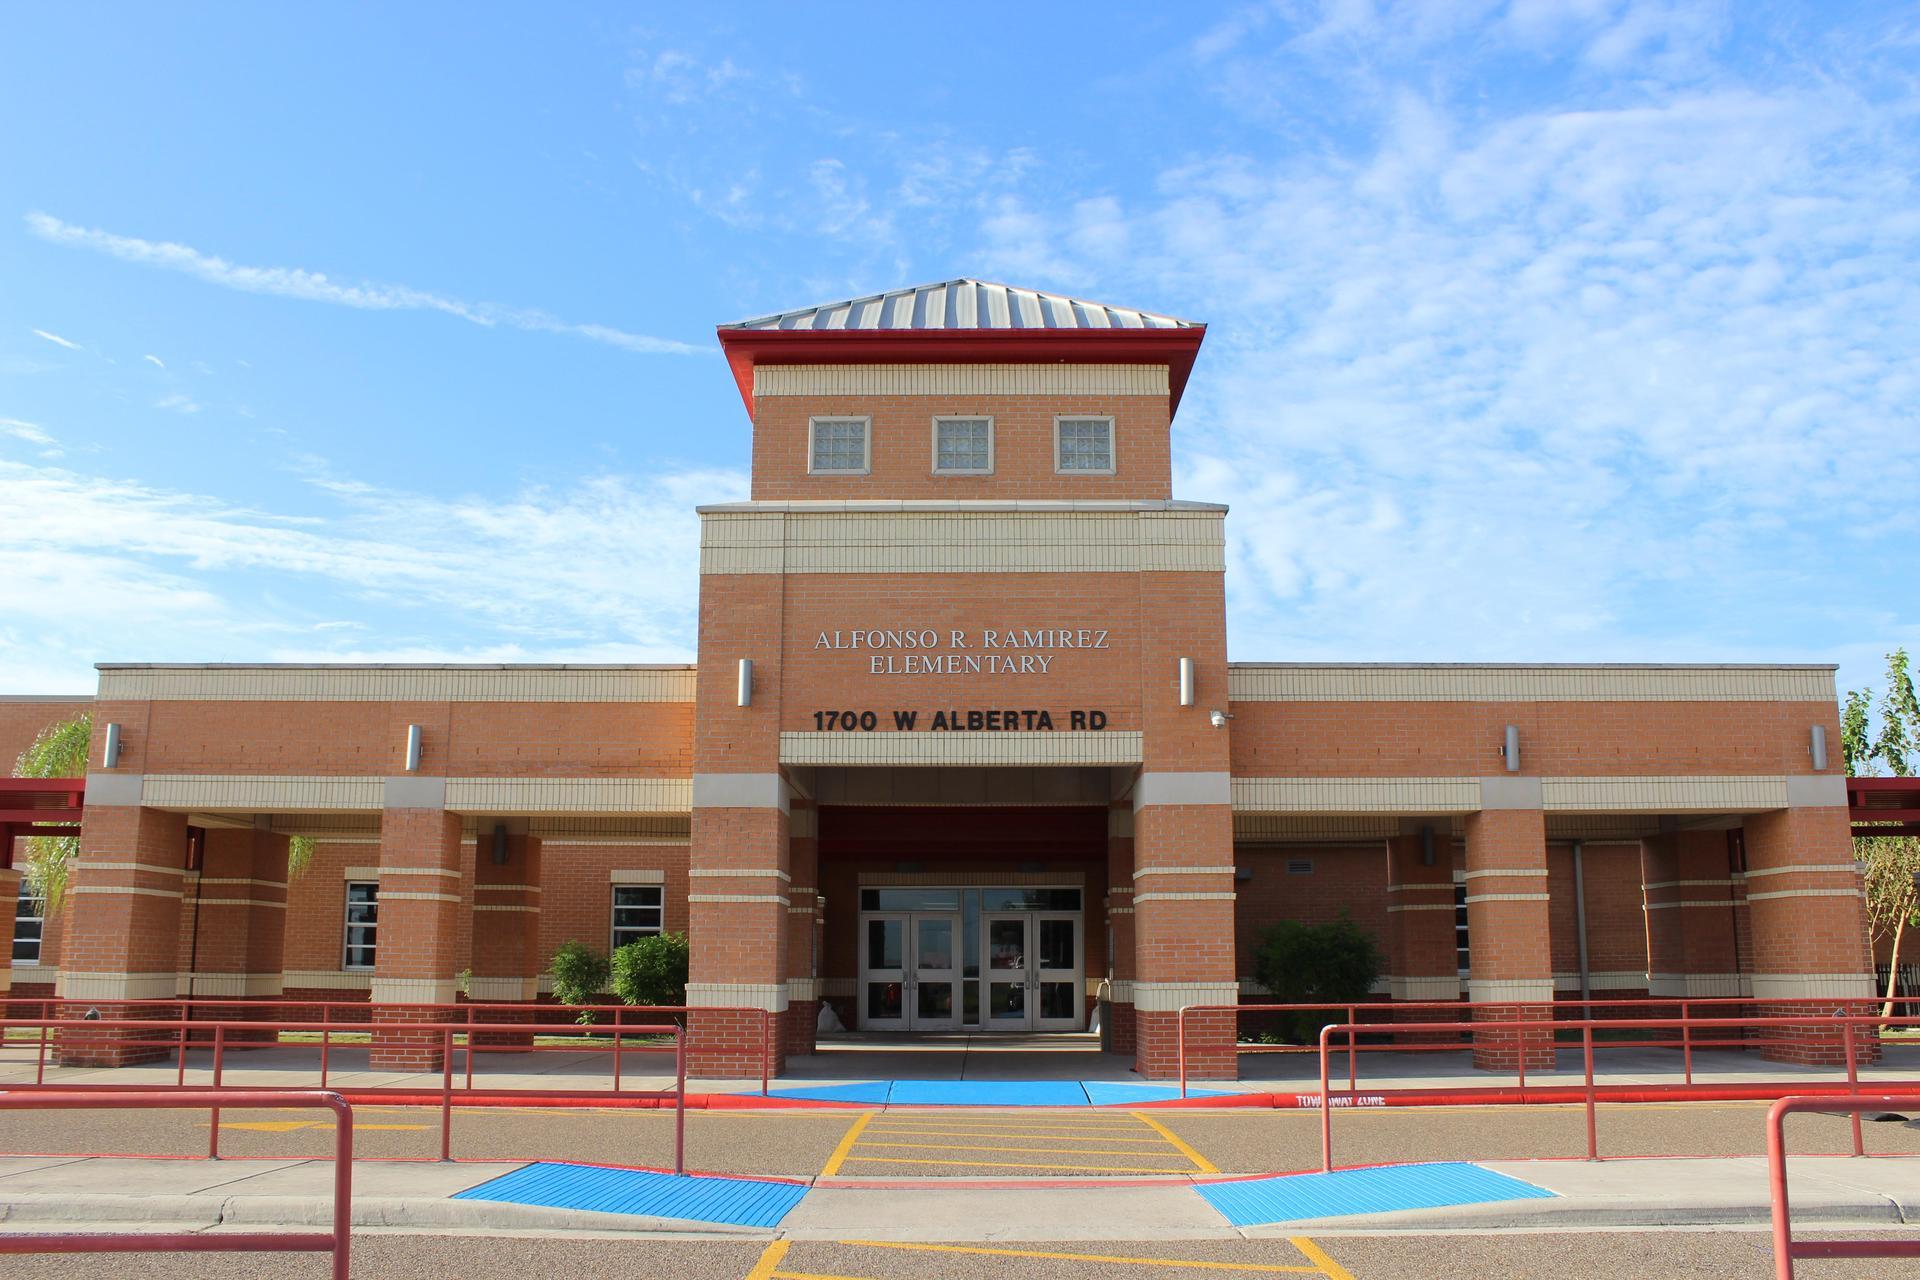 Ramirez Elementary